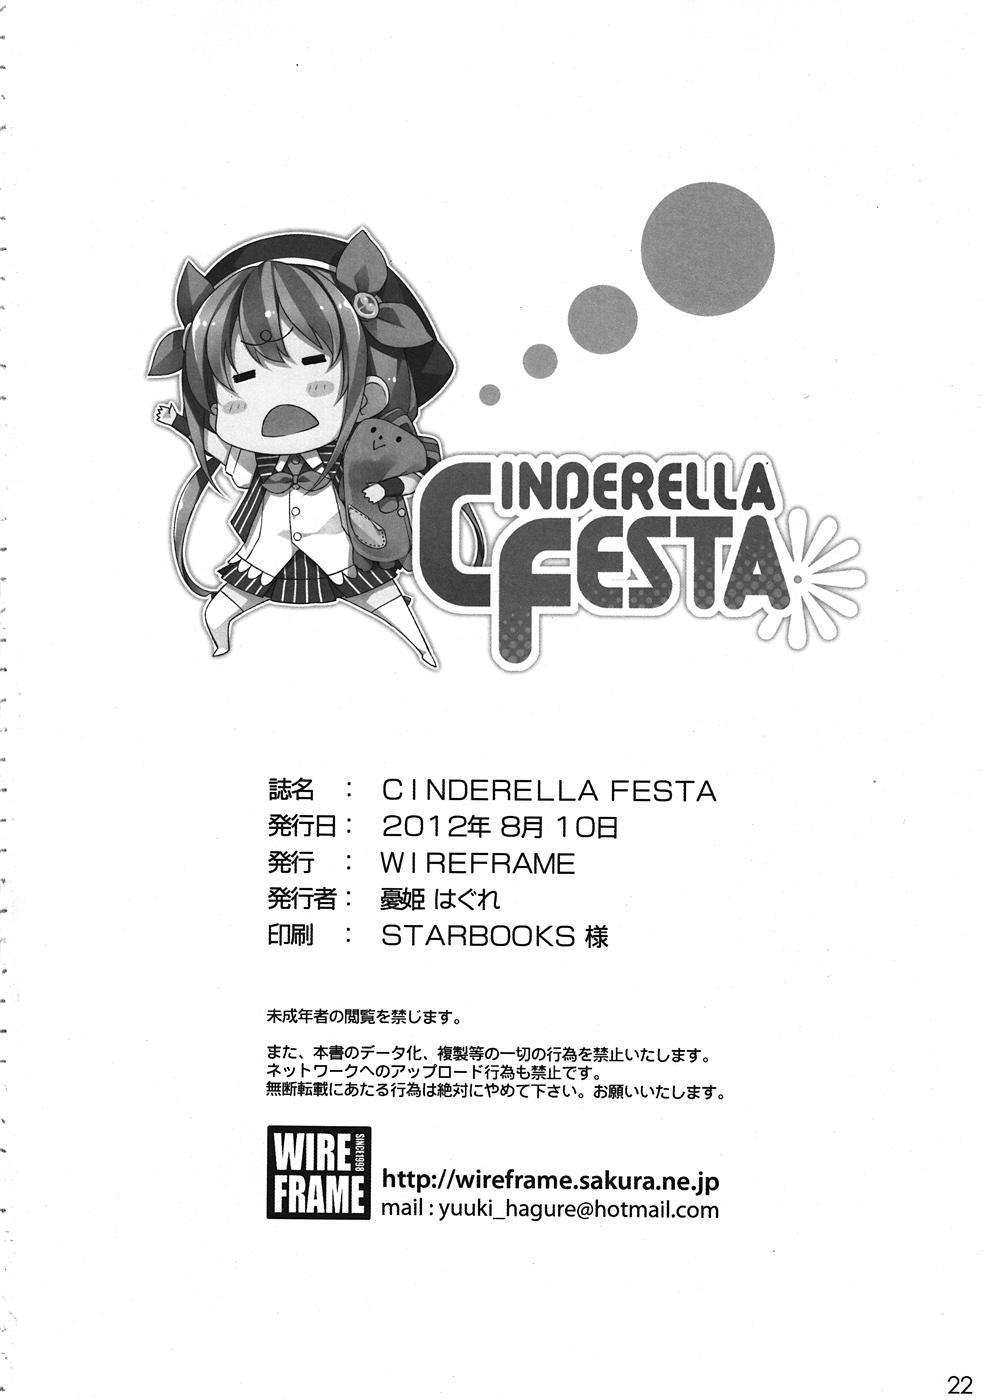 CINDERELLA FESTA 20